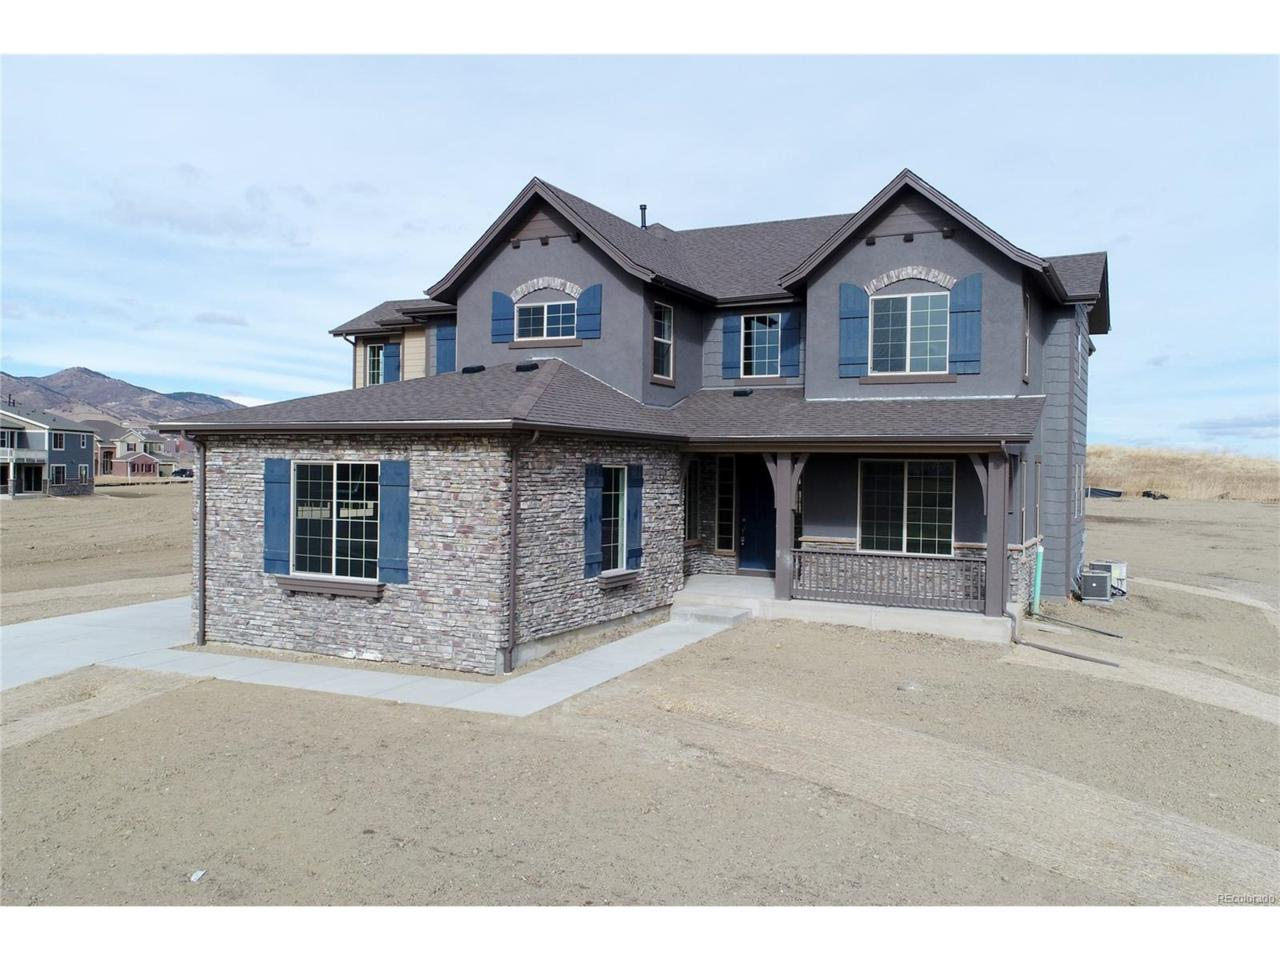 8680 Hunters Hill Lane, Littleton, CO 80125 (MLS #9080641) :: 8z Real Estate